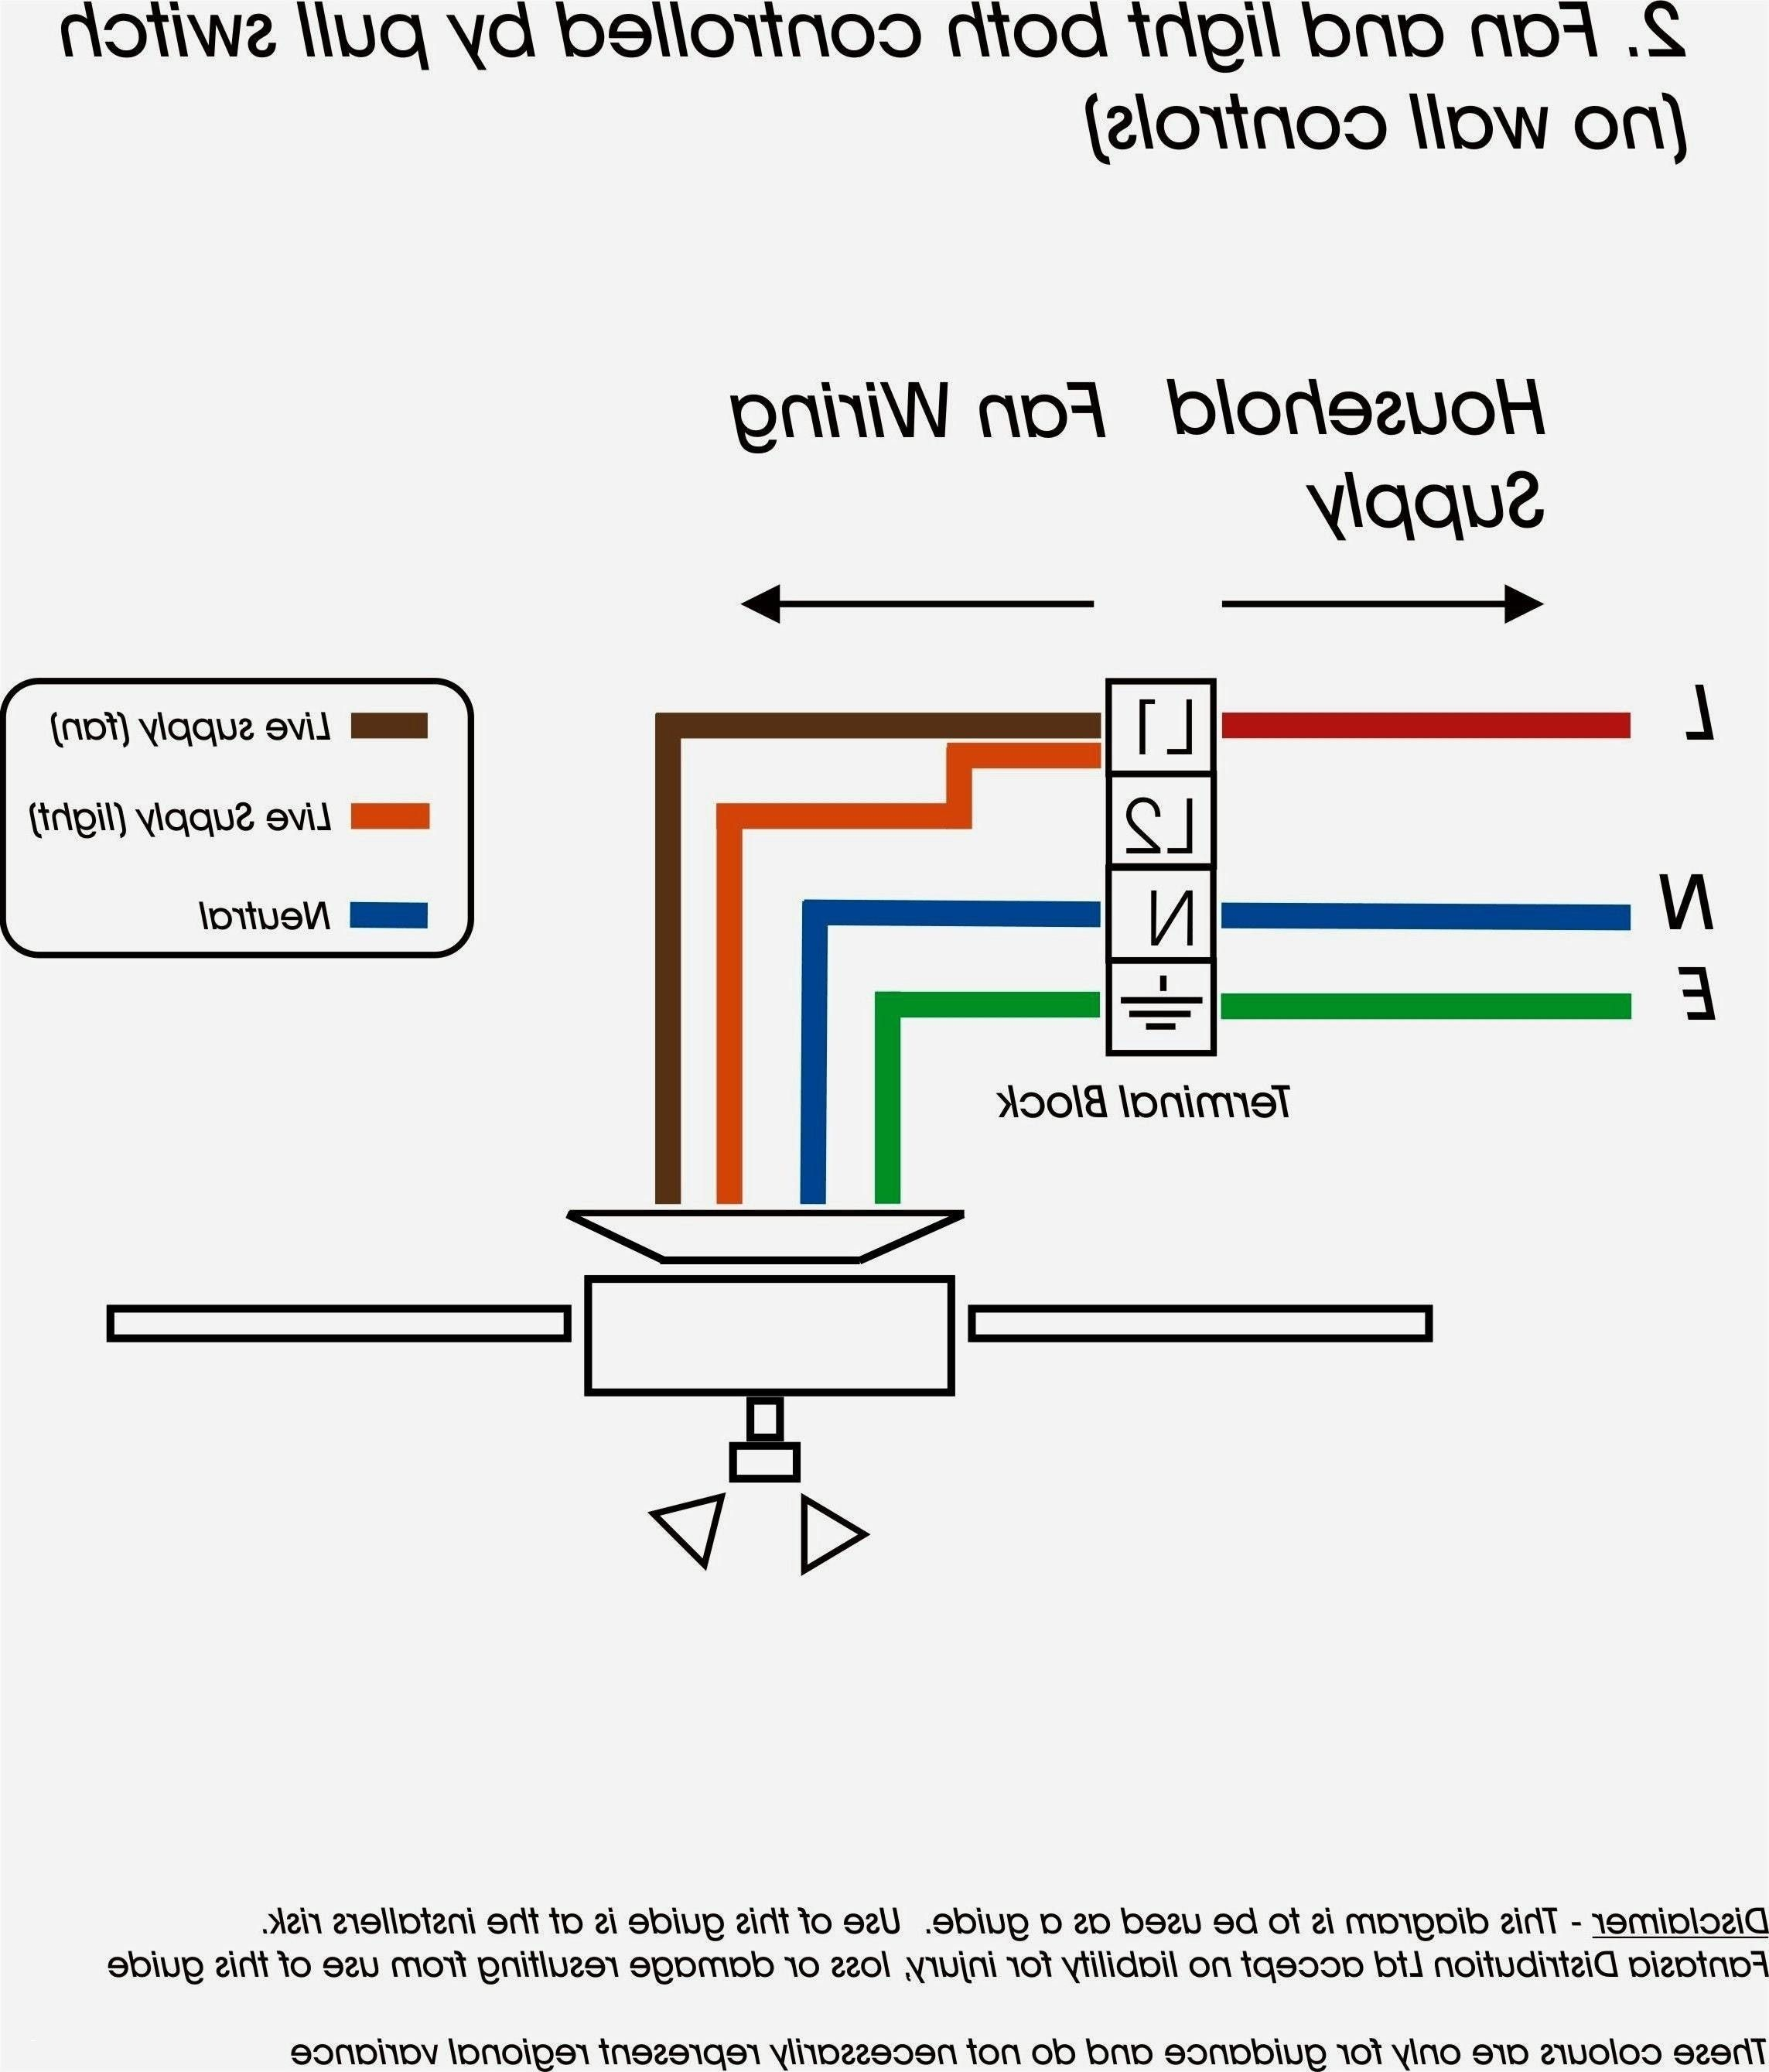 Flat 4 Trailer Plug Wiring Diagram from i.pinimg.com